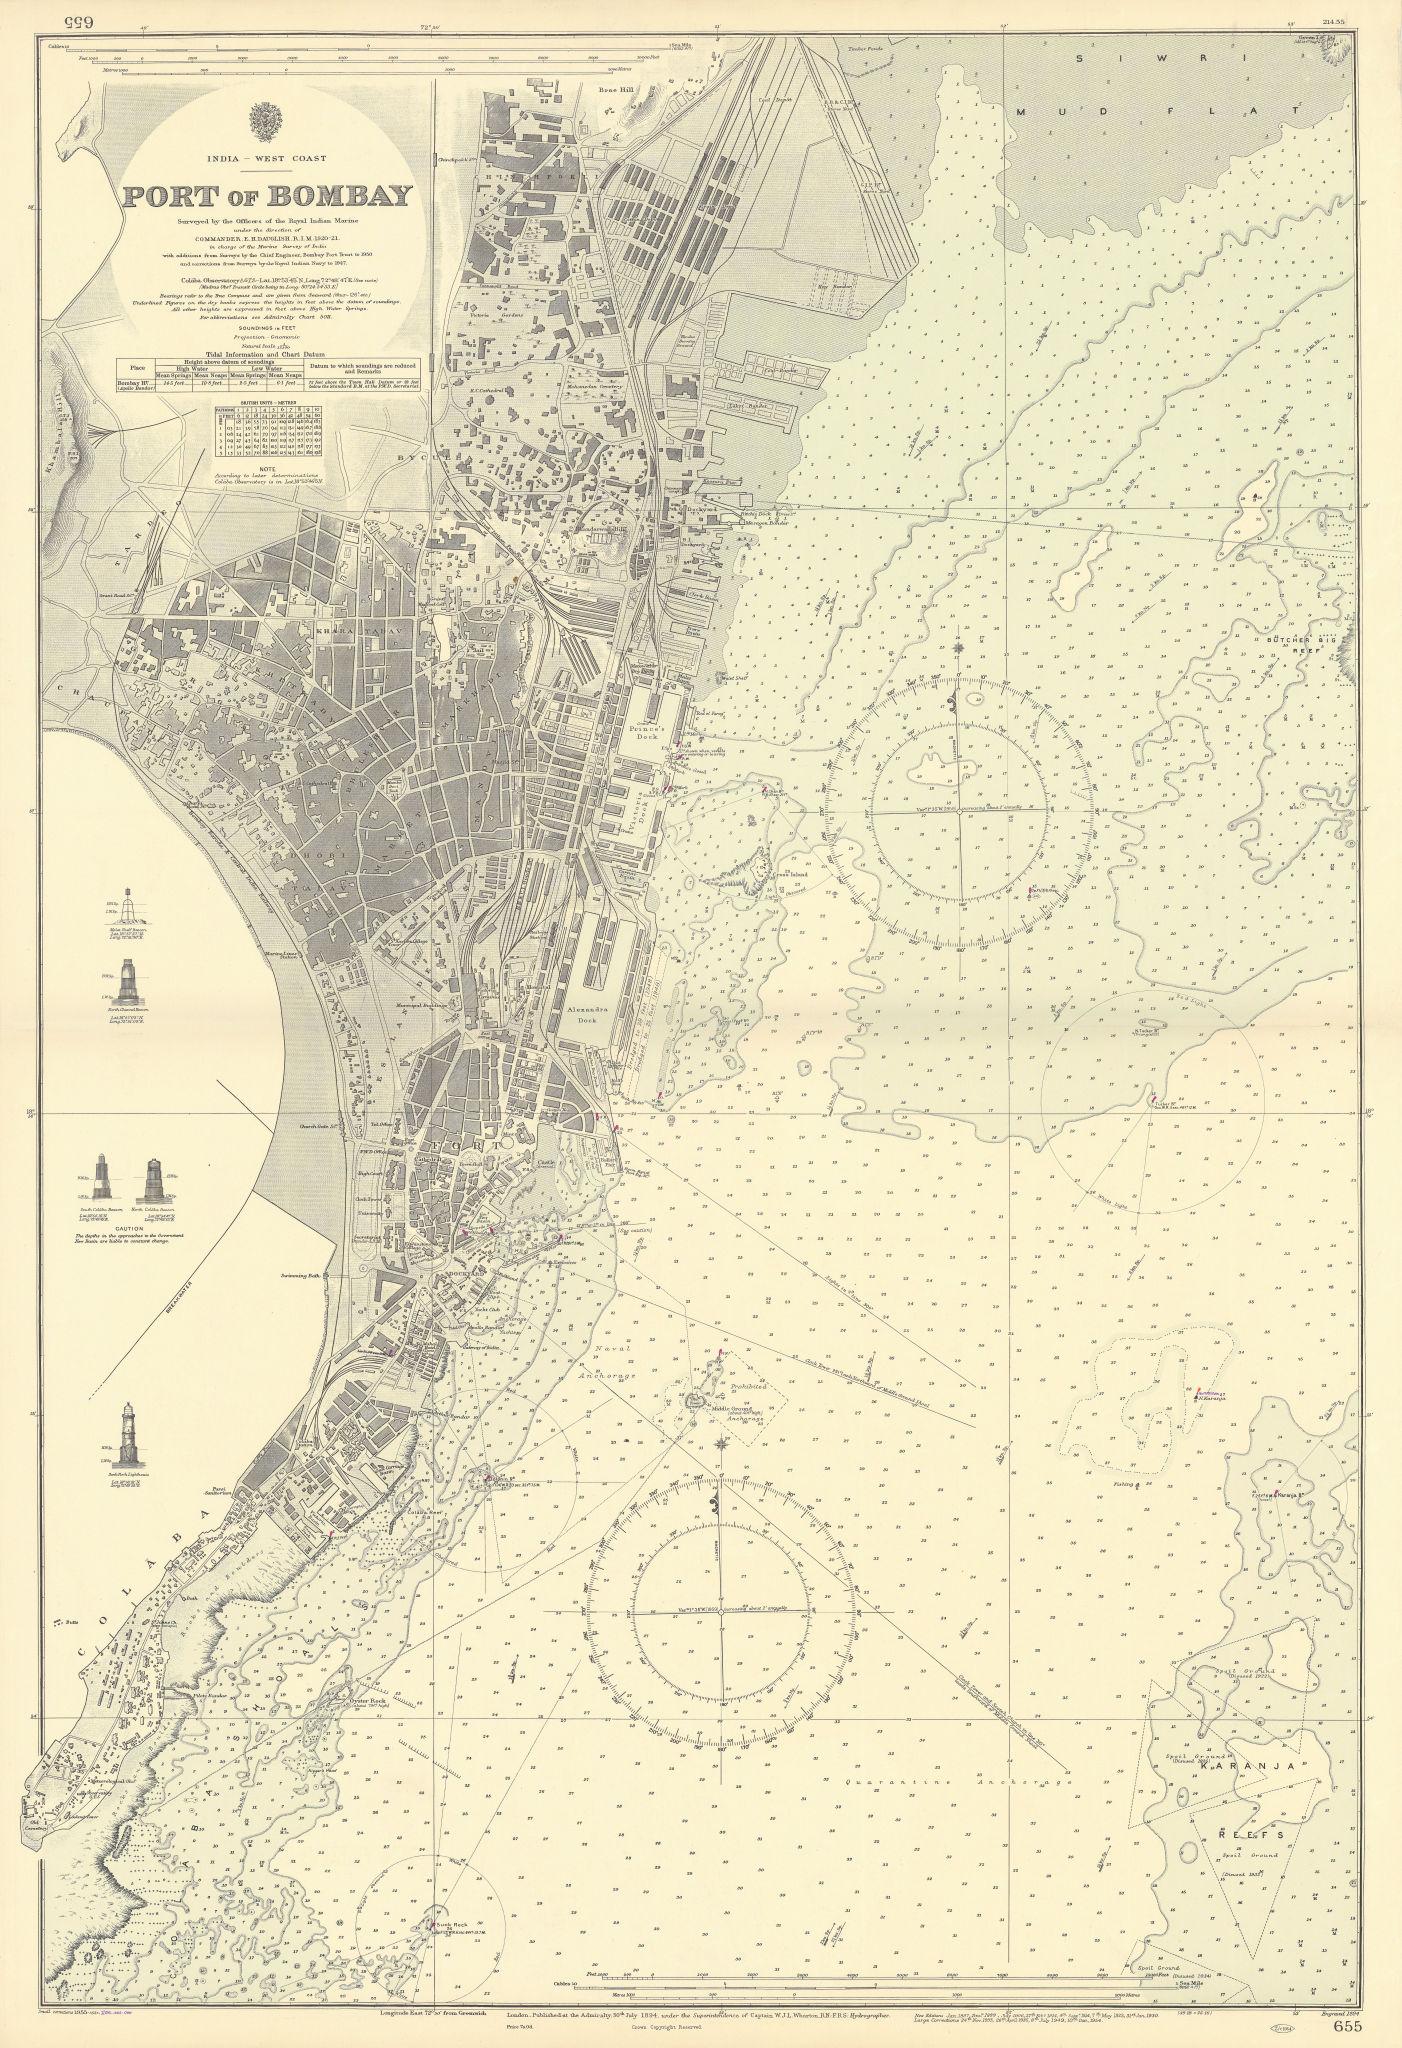 Port of Bombay. Mumbai India. ADMIRALTY sea chart 1894 (1956) old vintage map